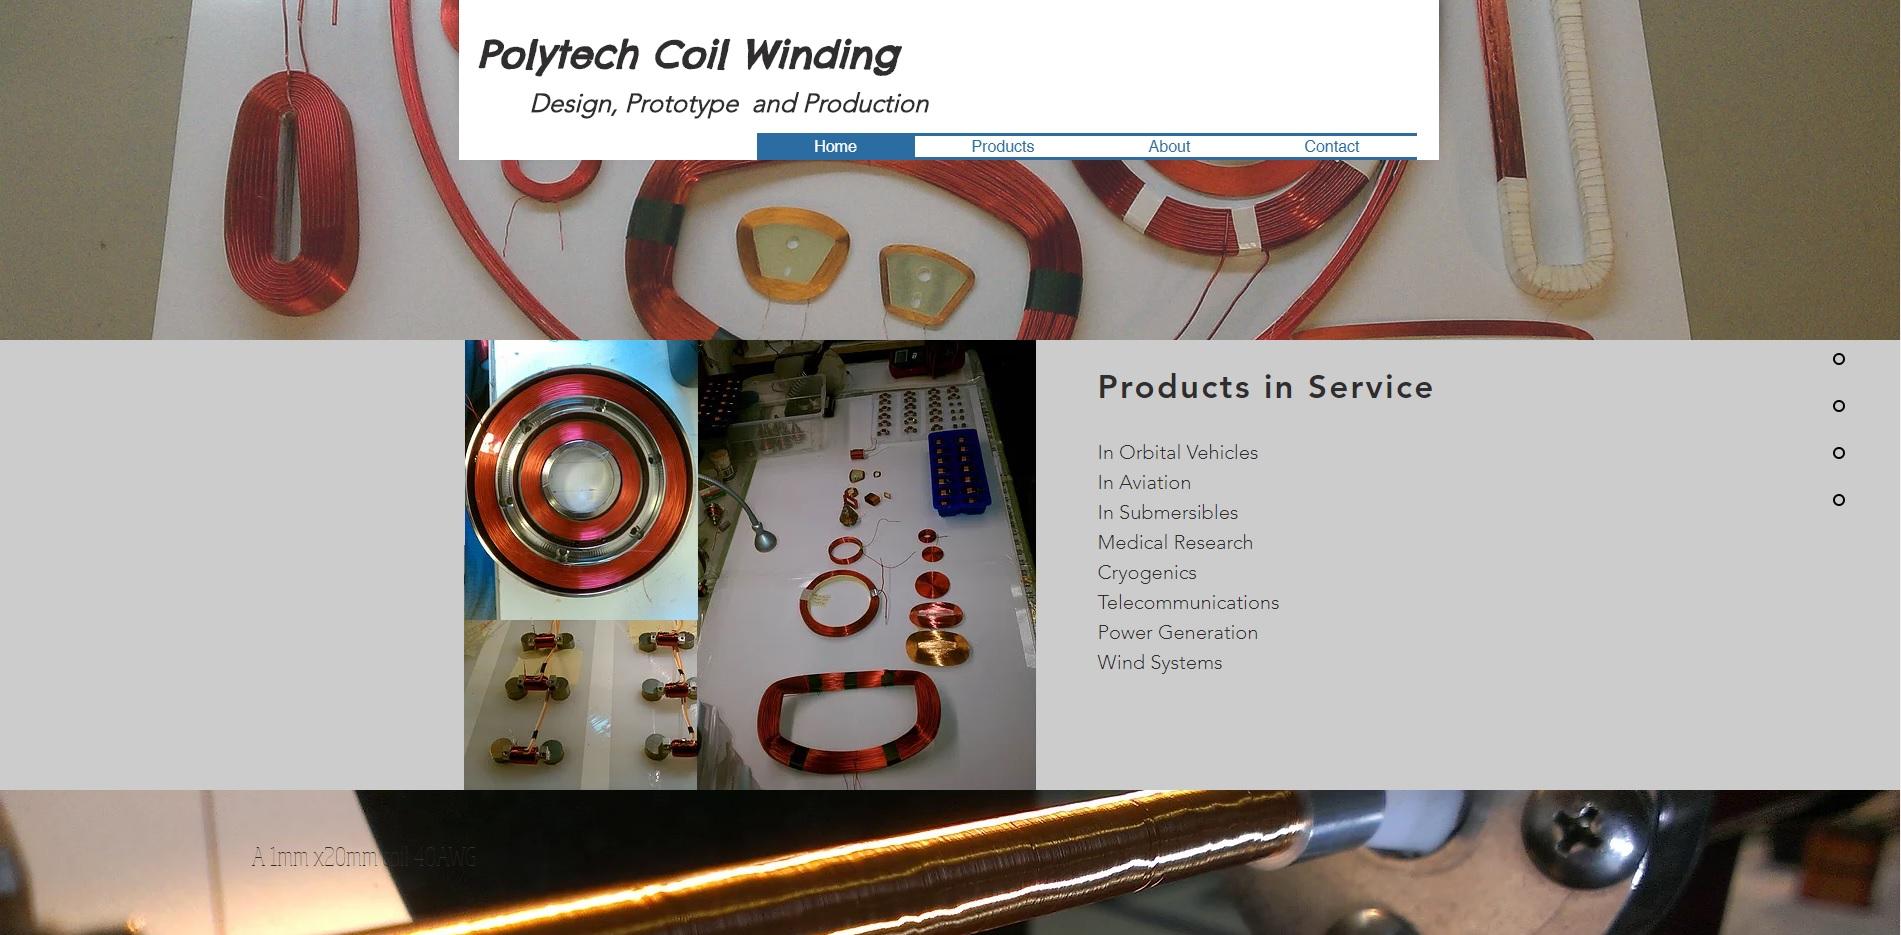 PolyTech Coil Winding